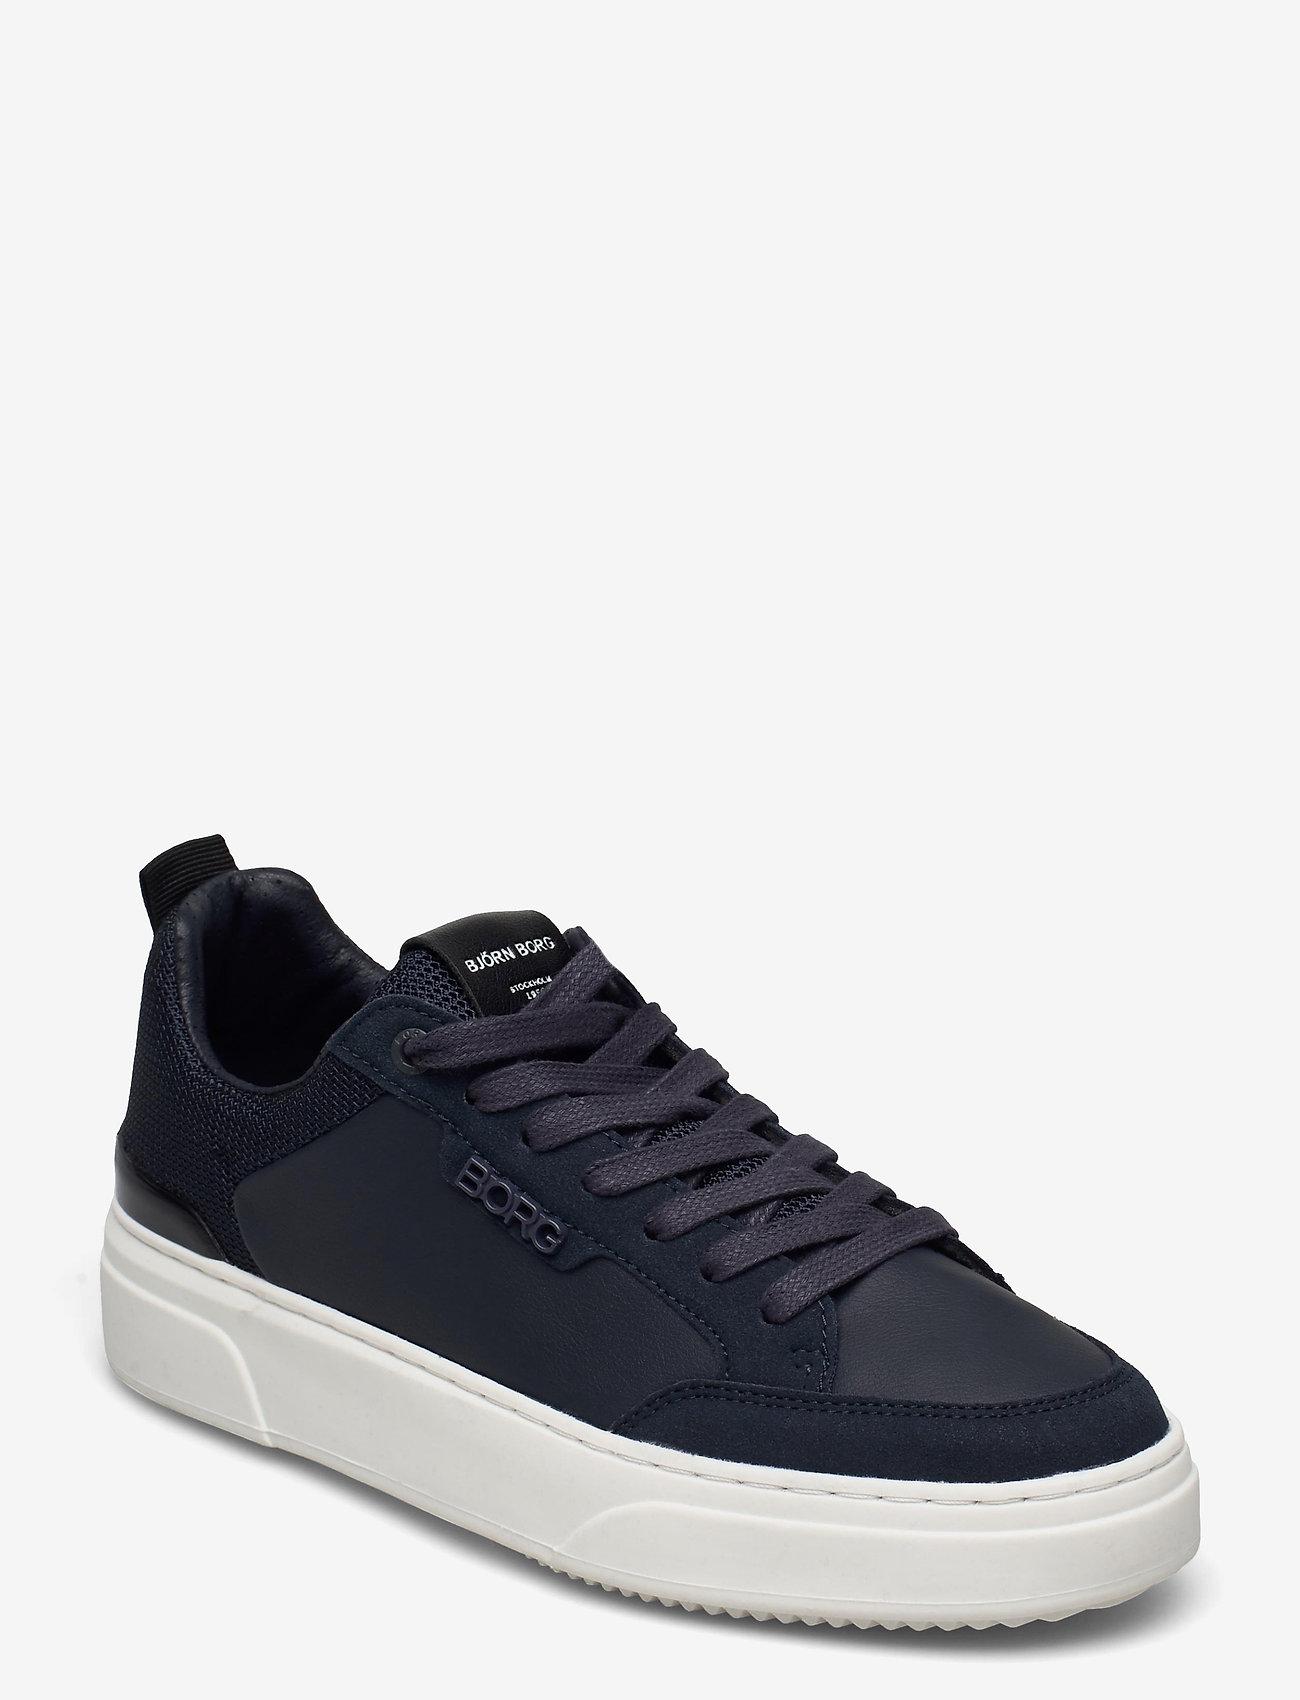 Björn Borg - T1900 NYL M - laag sneakers - navy-black - 0